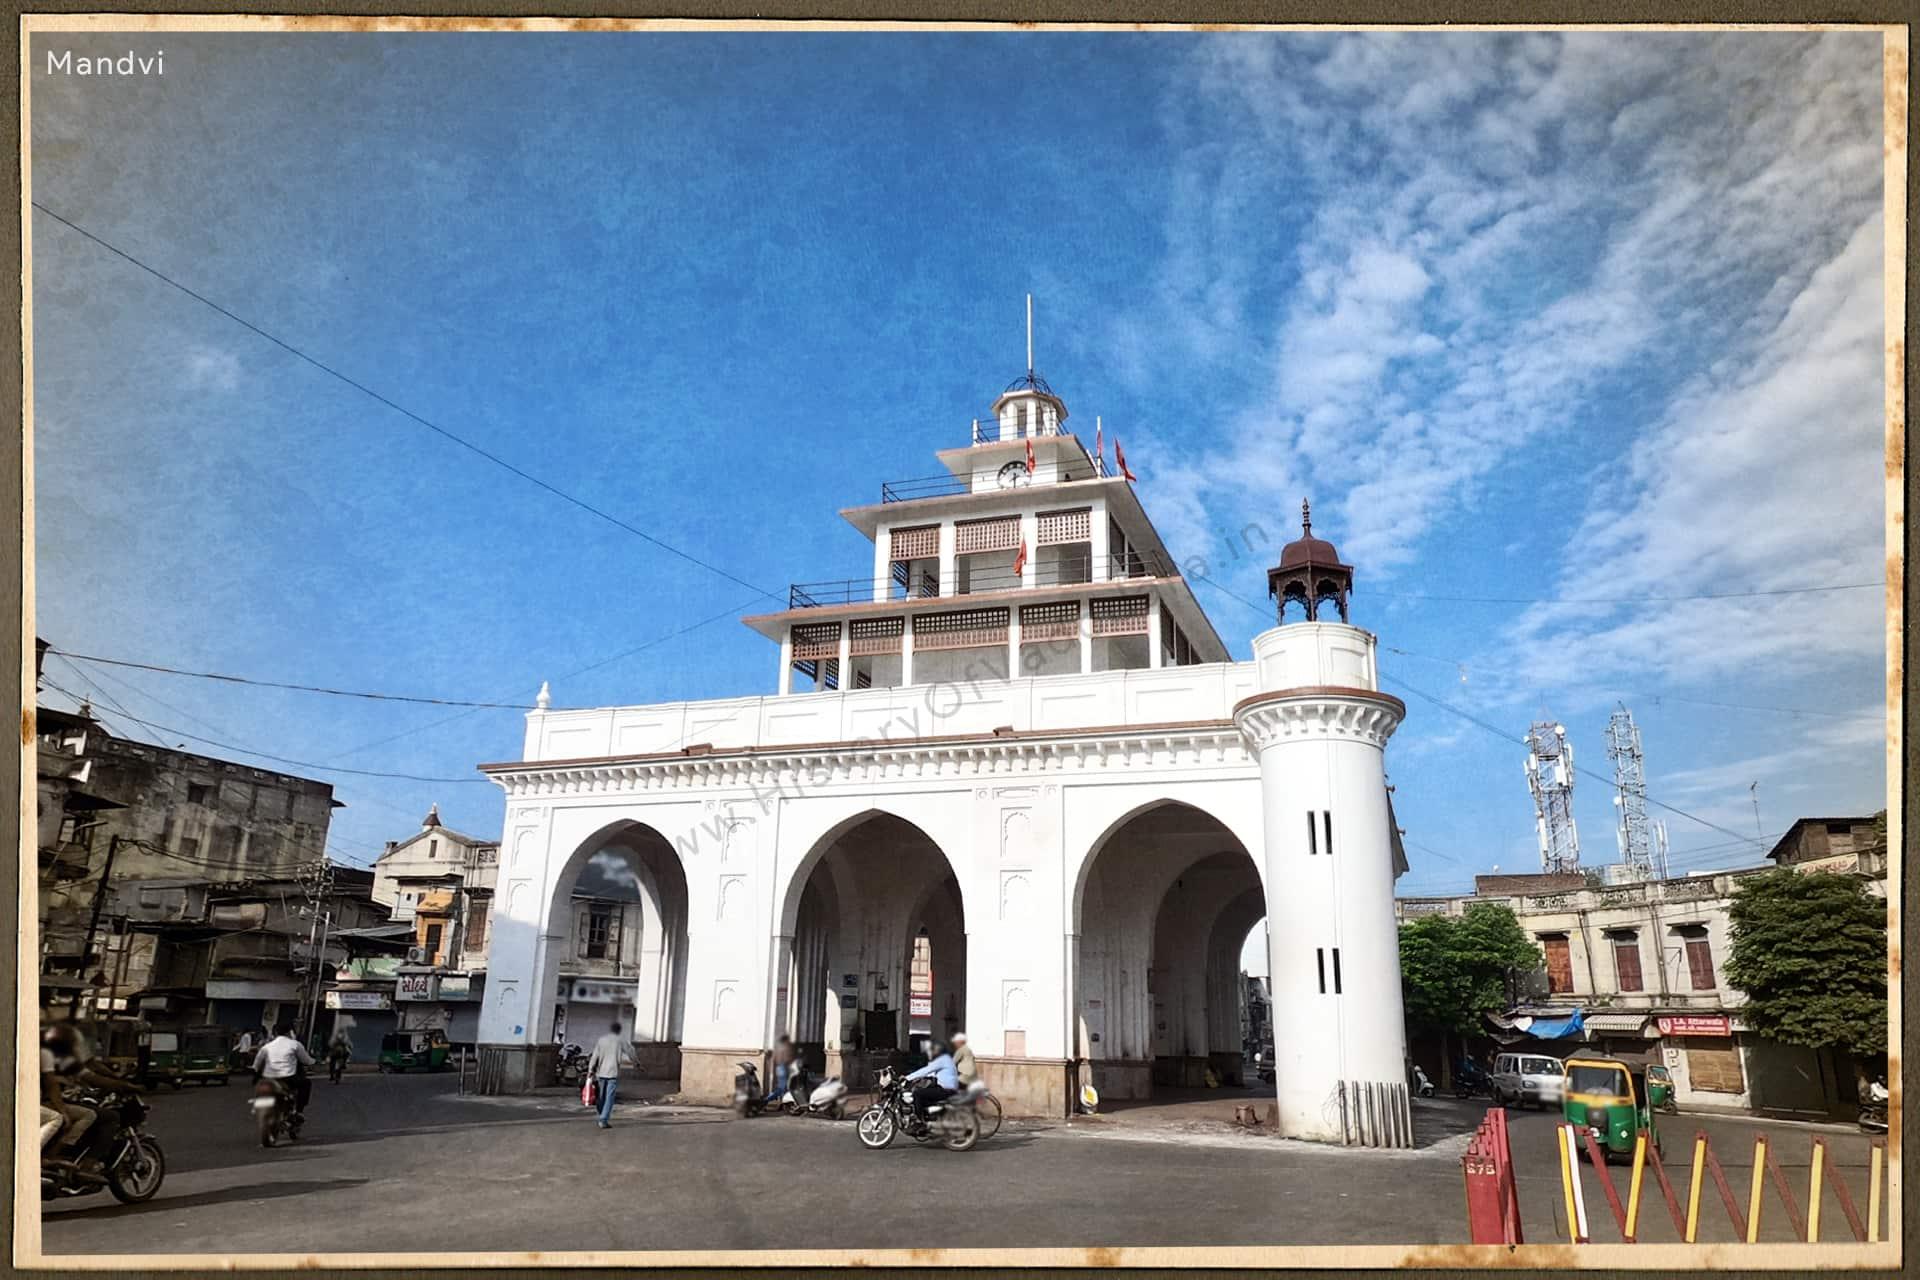 Mandvi Gate